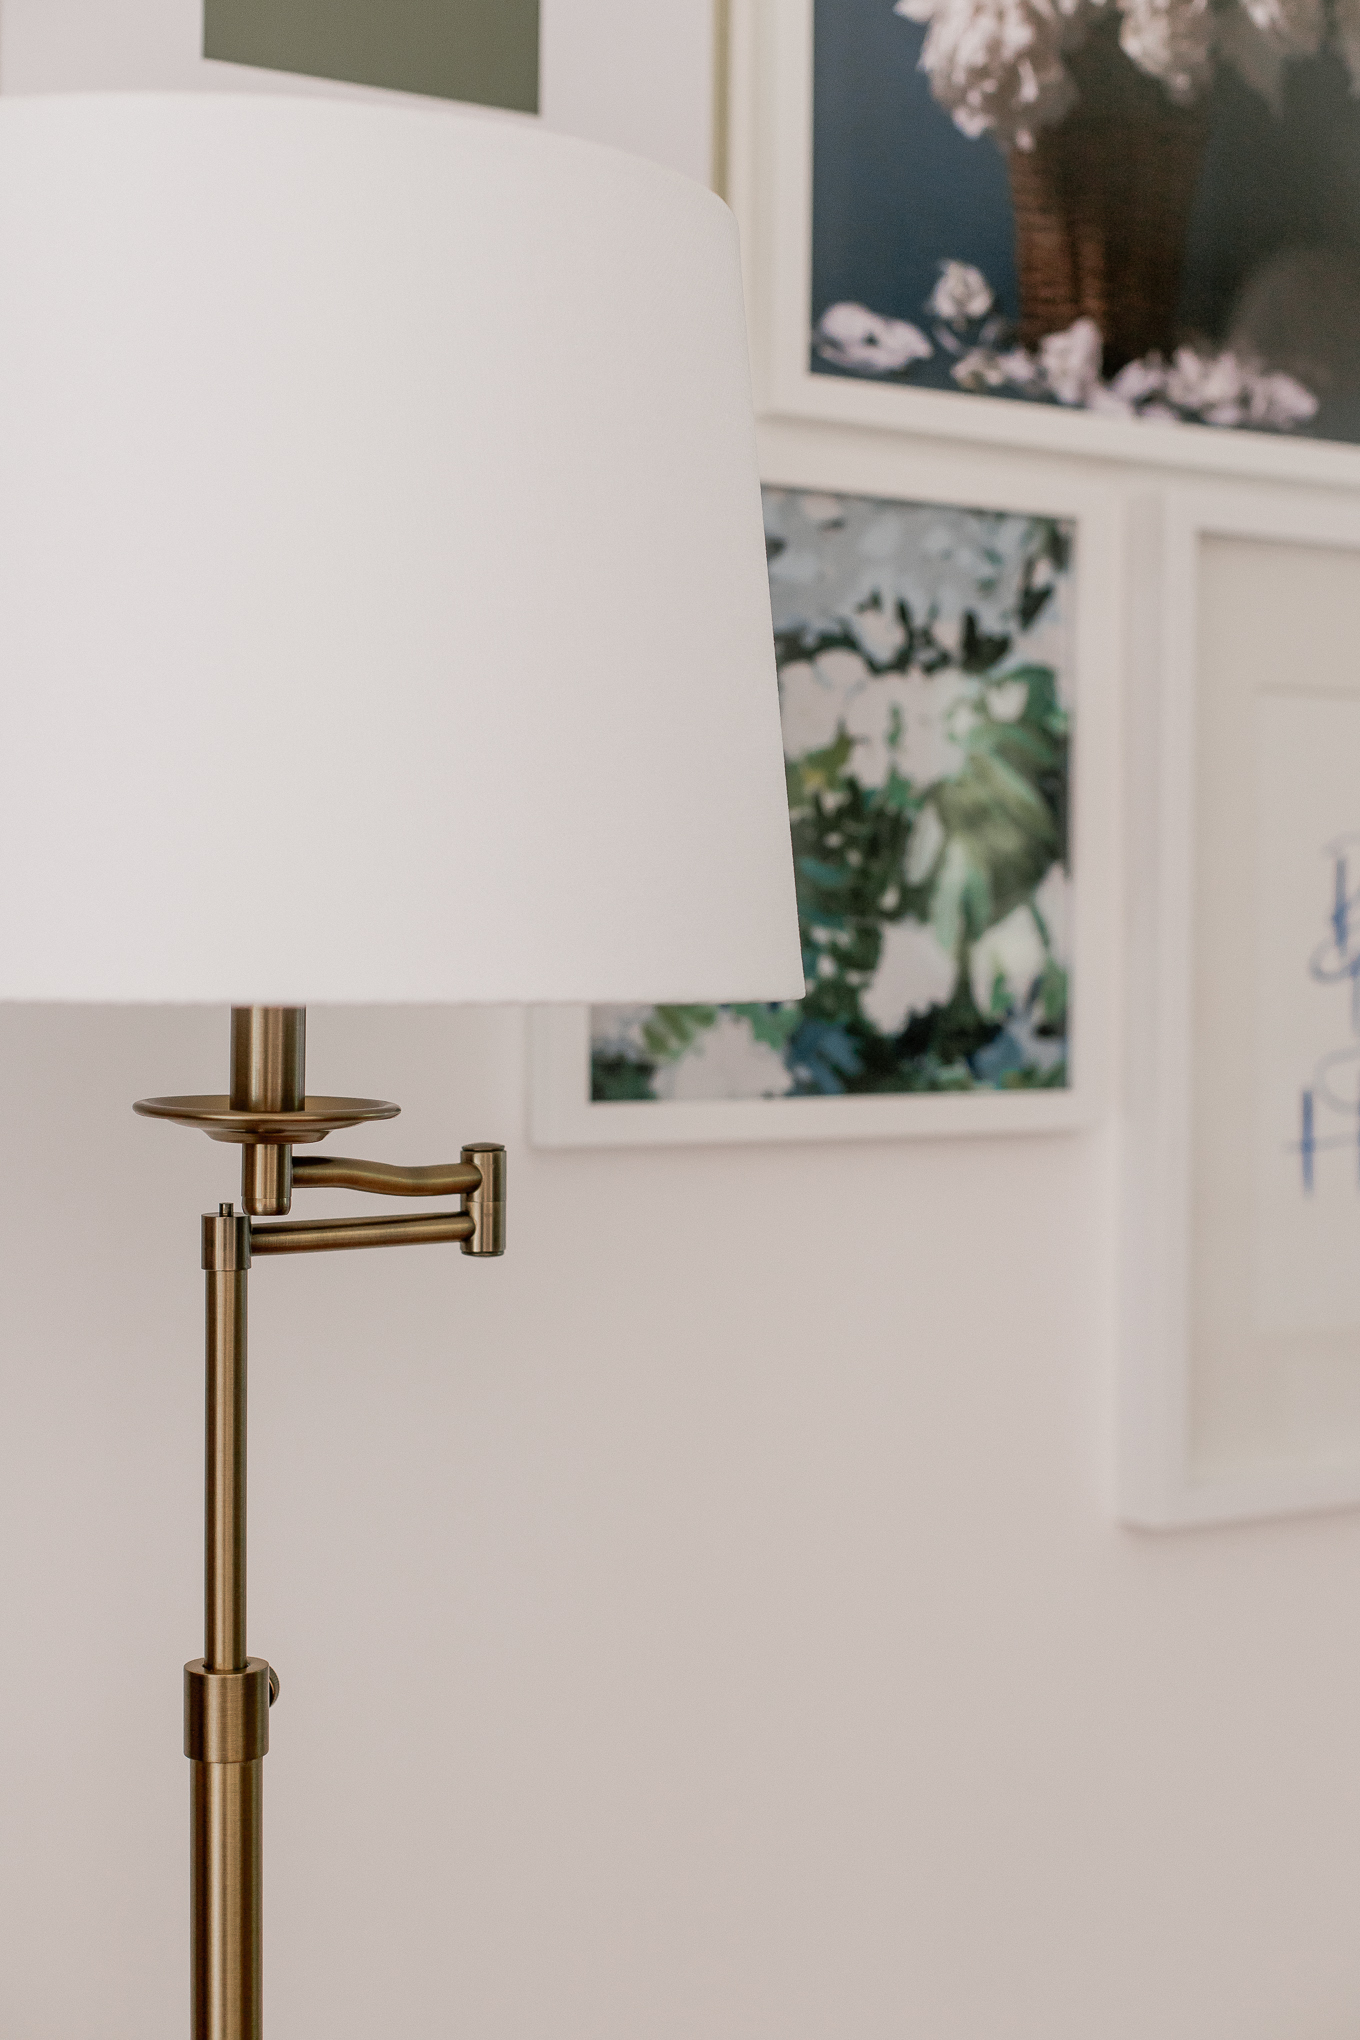 Antique Brass Swing Arm Floor Lamp | Beautiful Vintage Inspired Floor Lamp | Louella Reese